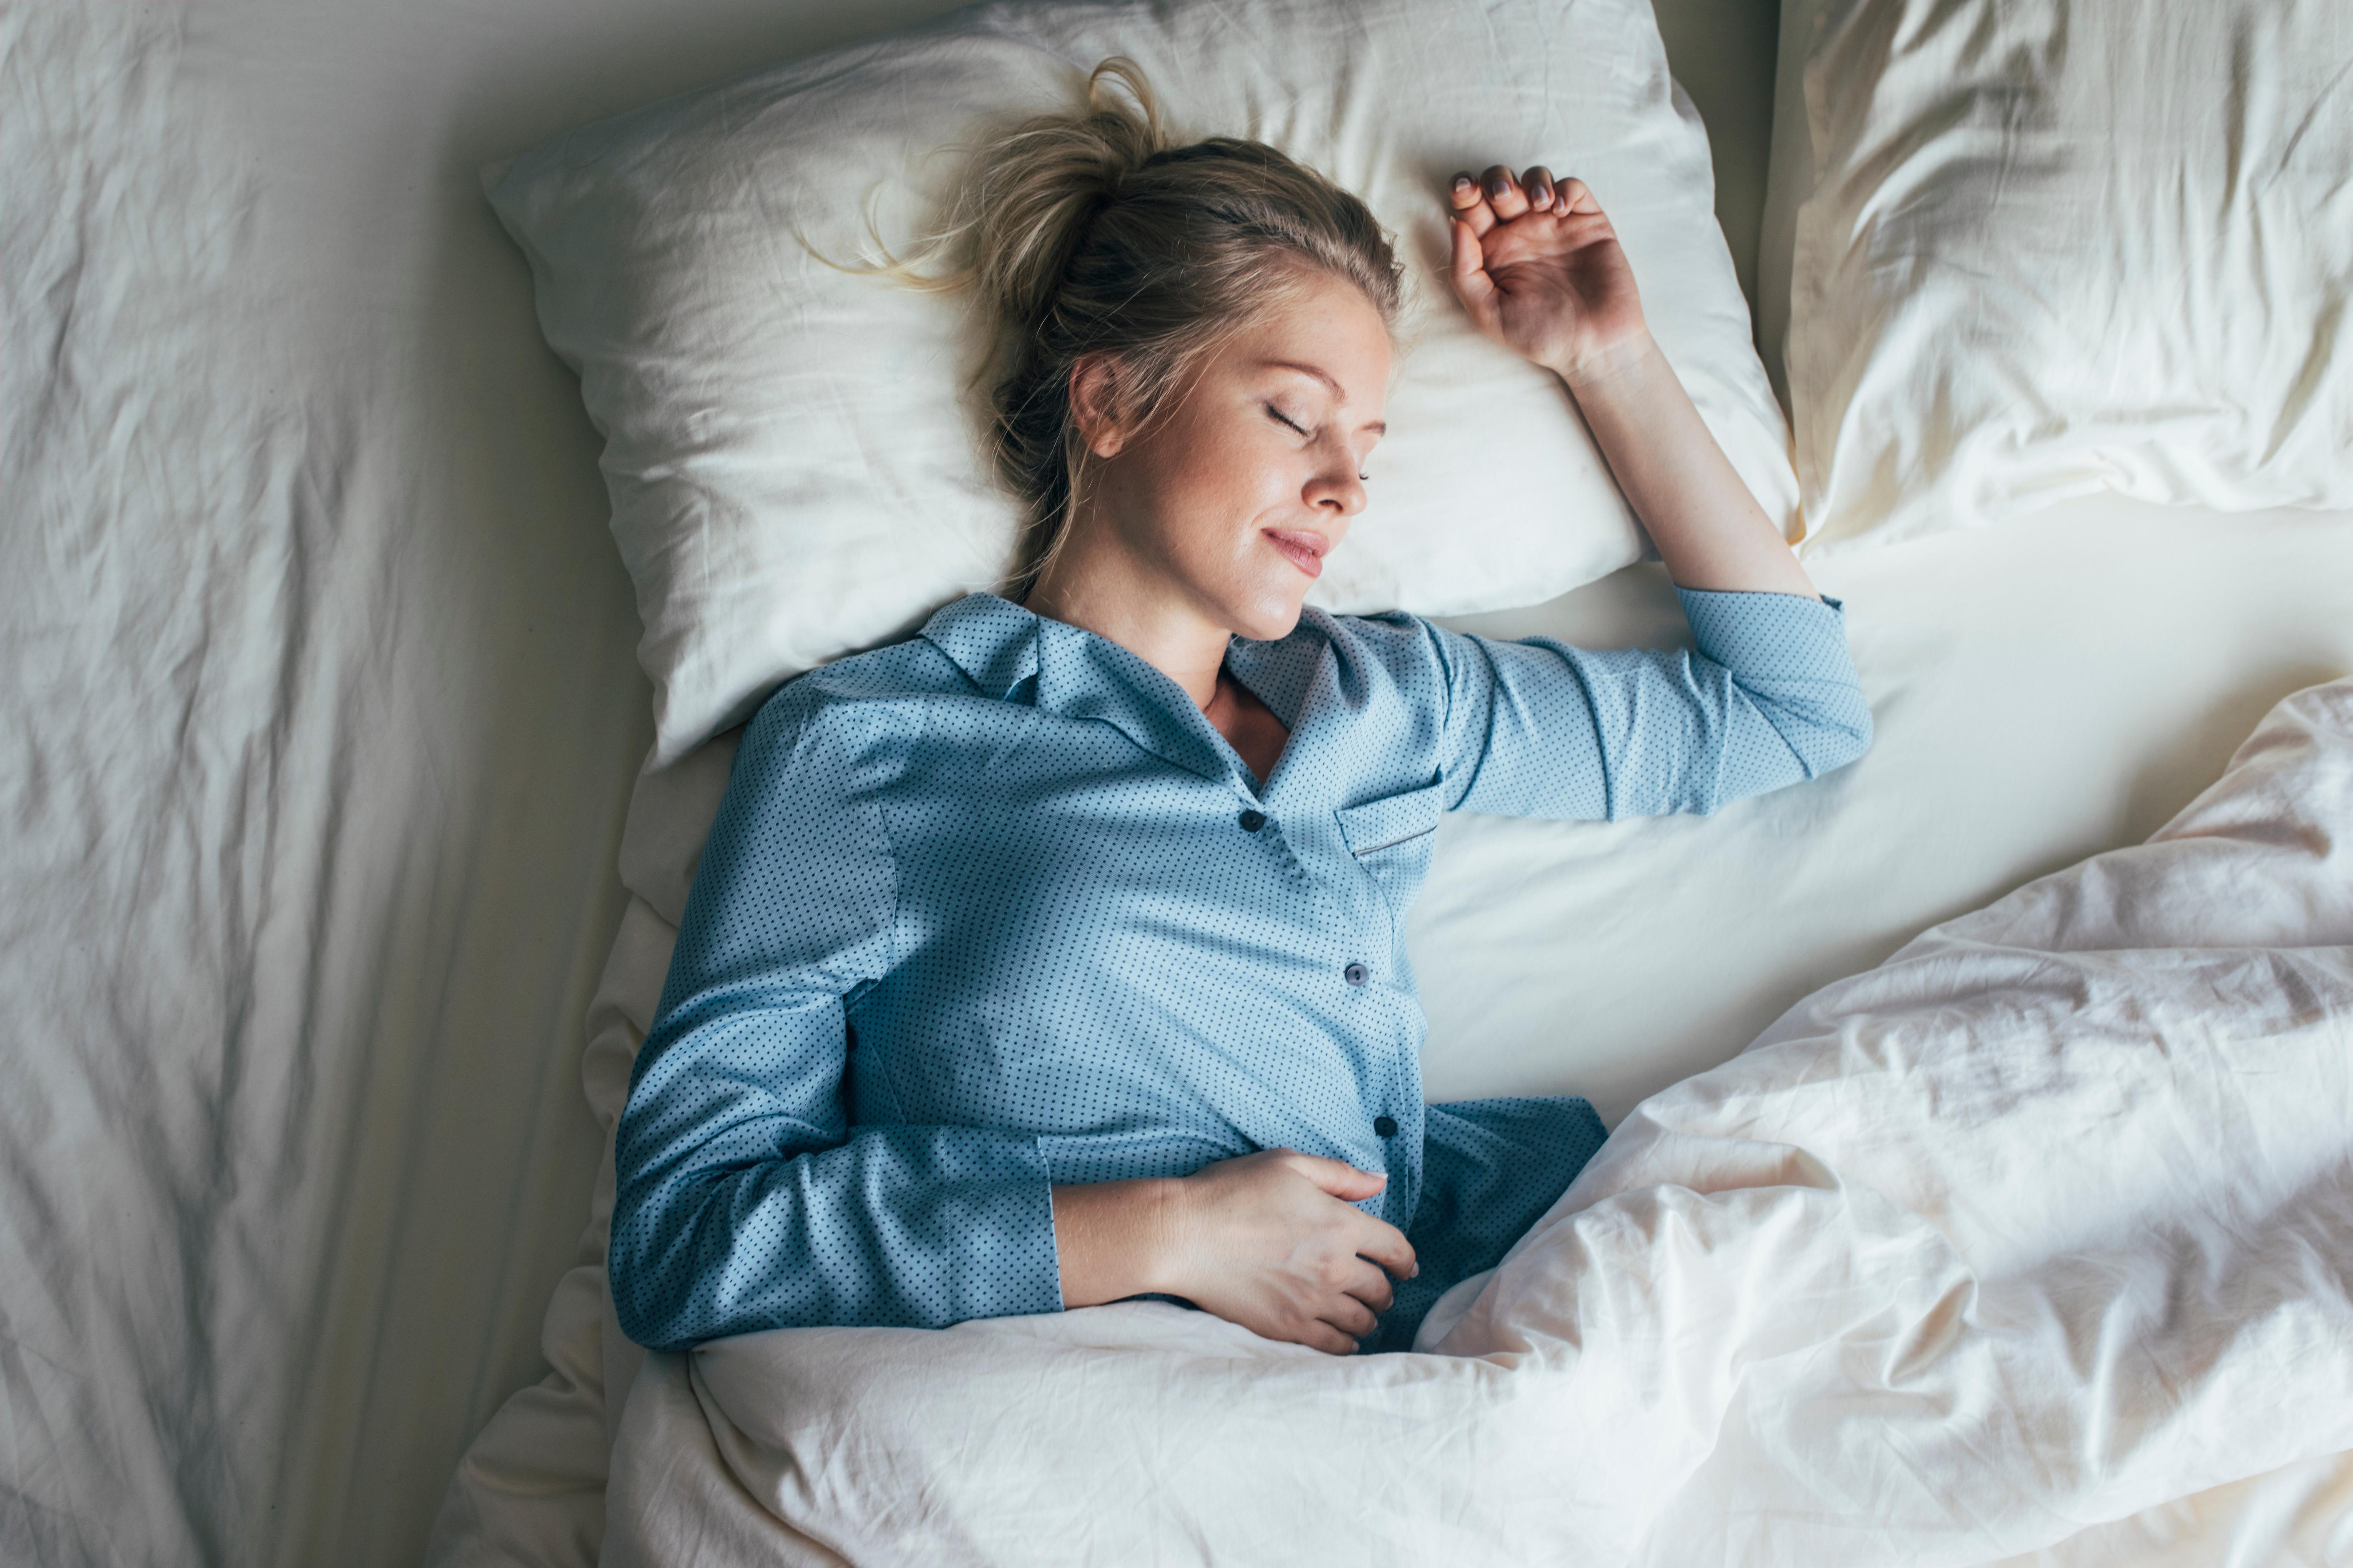 Meditation for Good Night Sleep